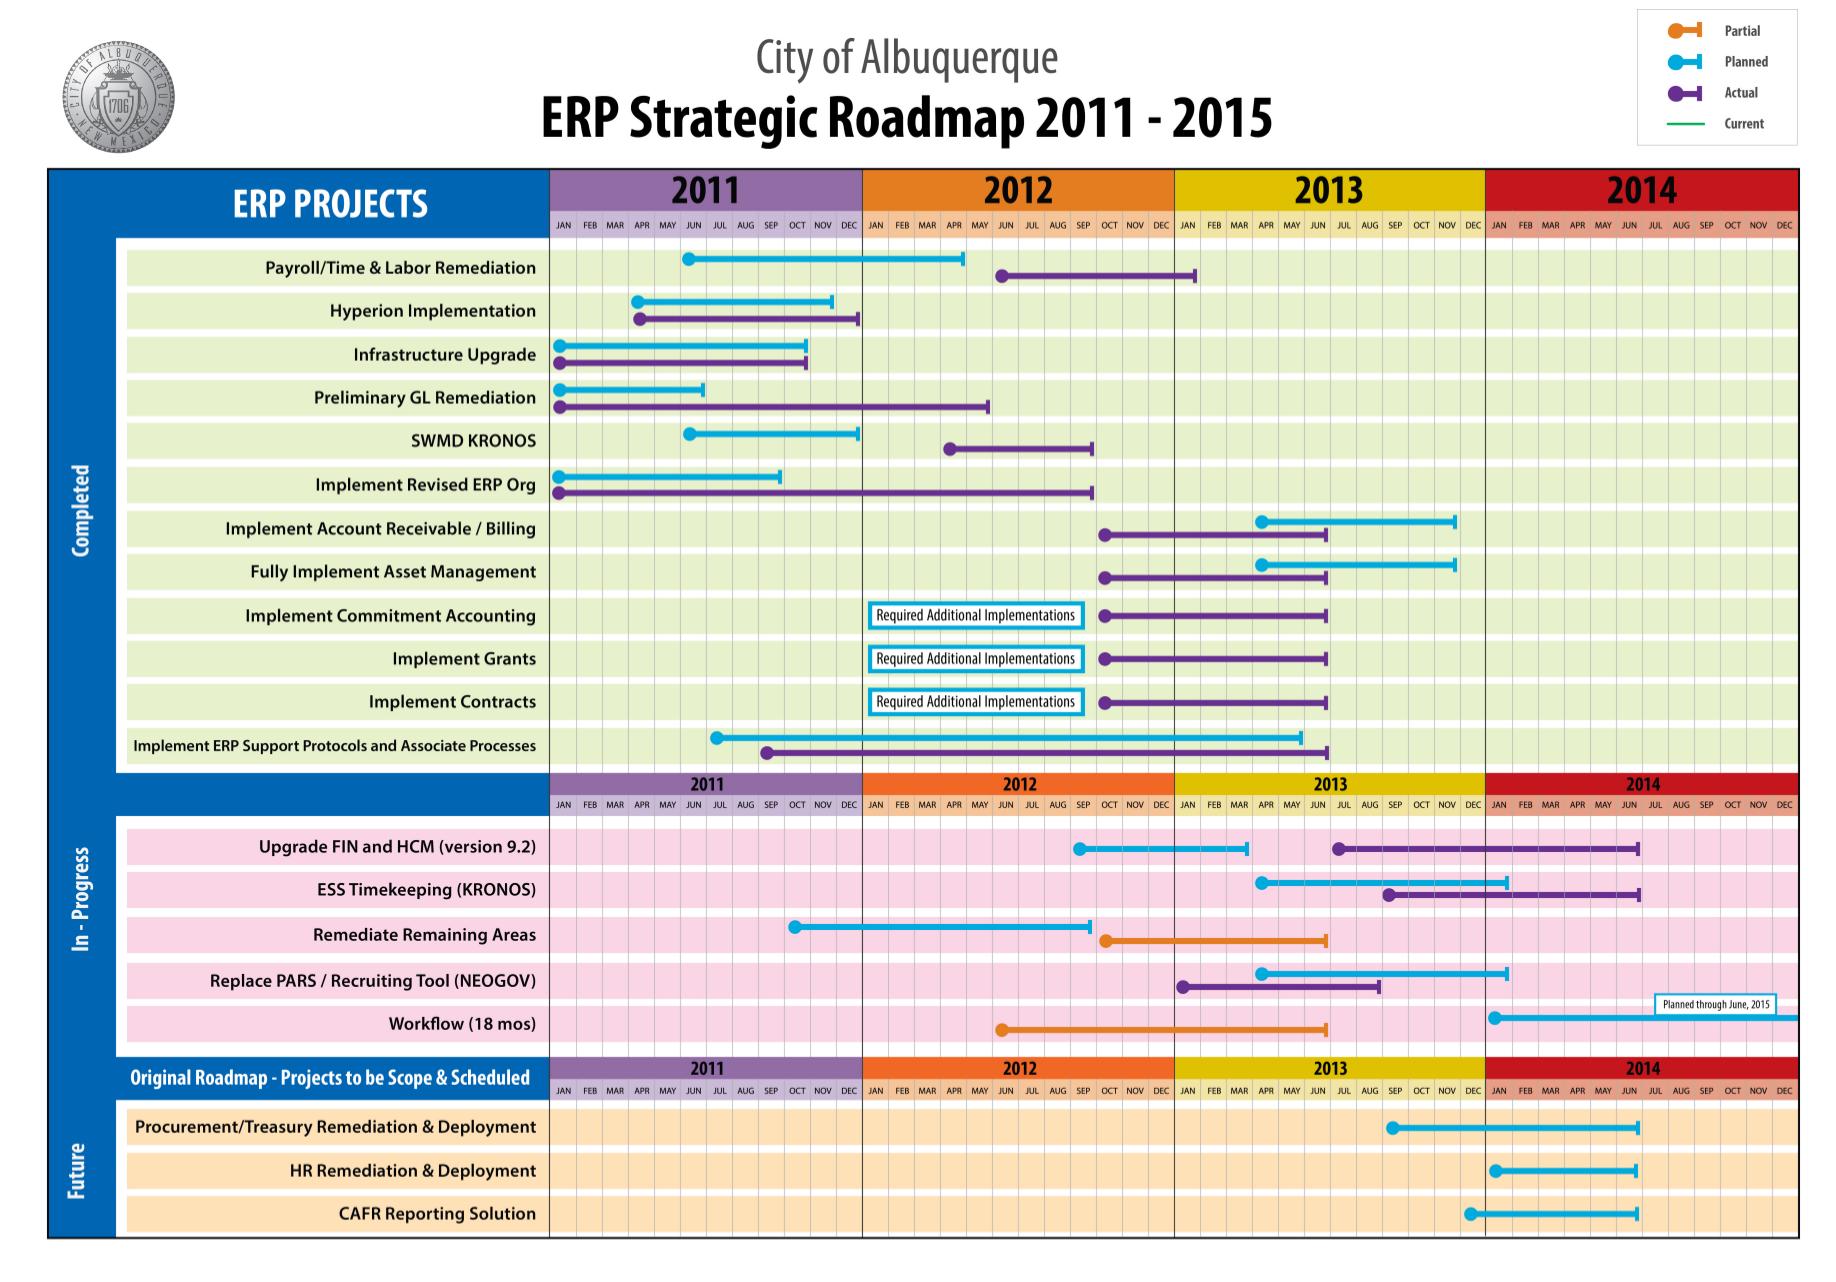 2013 ERP Roadmap